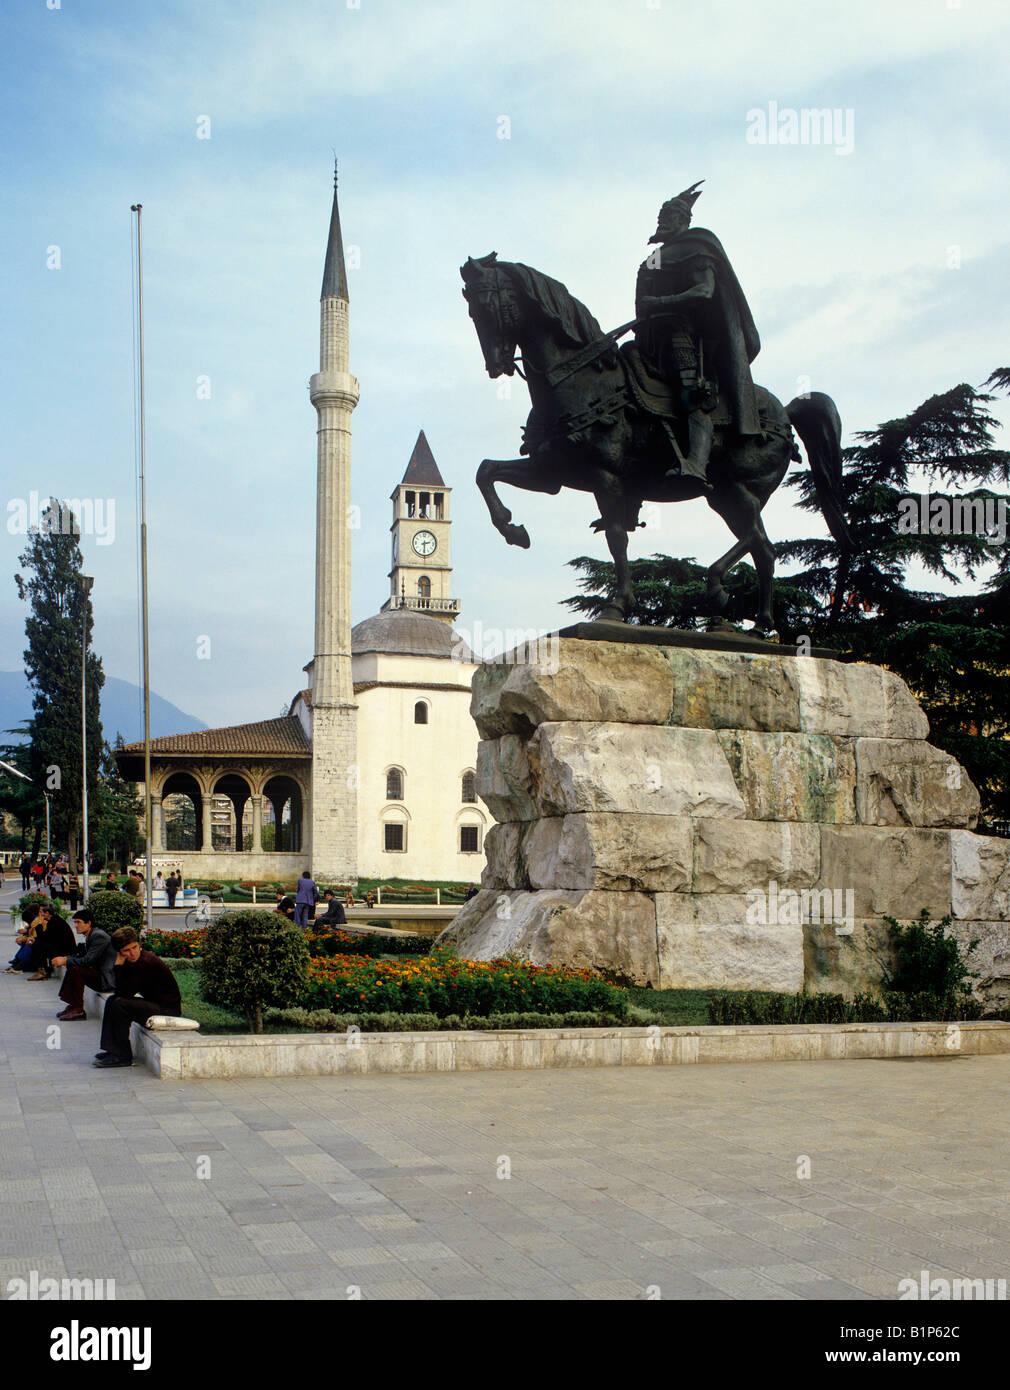 sahatit bell tower and et hem bey mosque monument of skanderbeg on skanderbeg square city of tirana albania - Stock Image